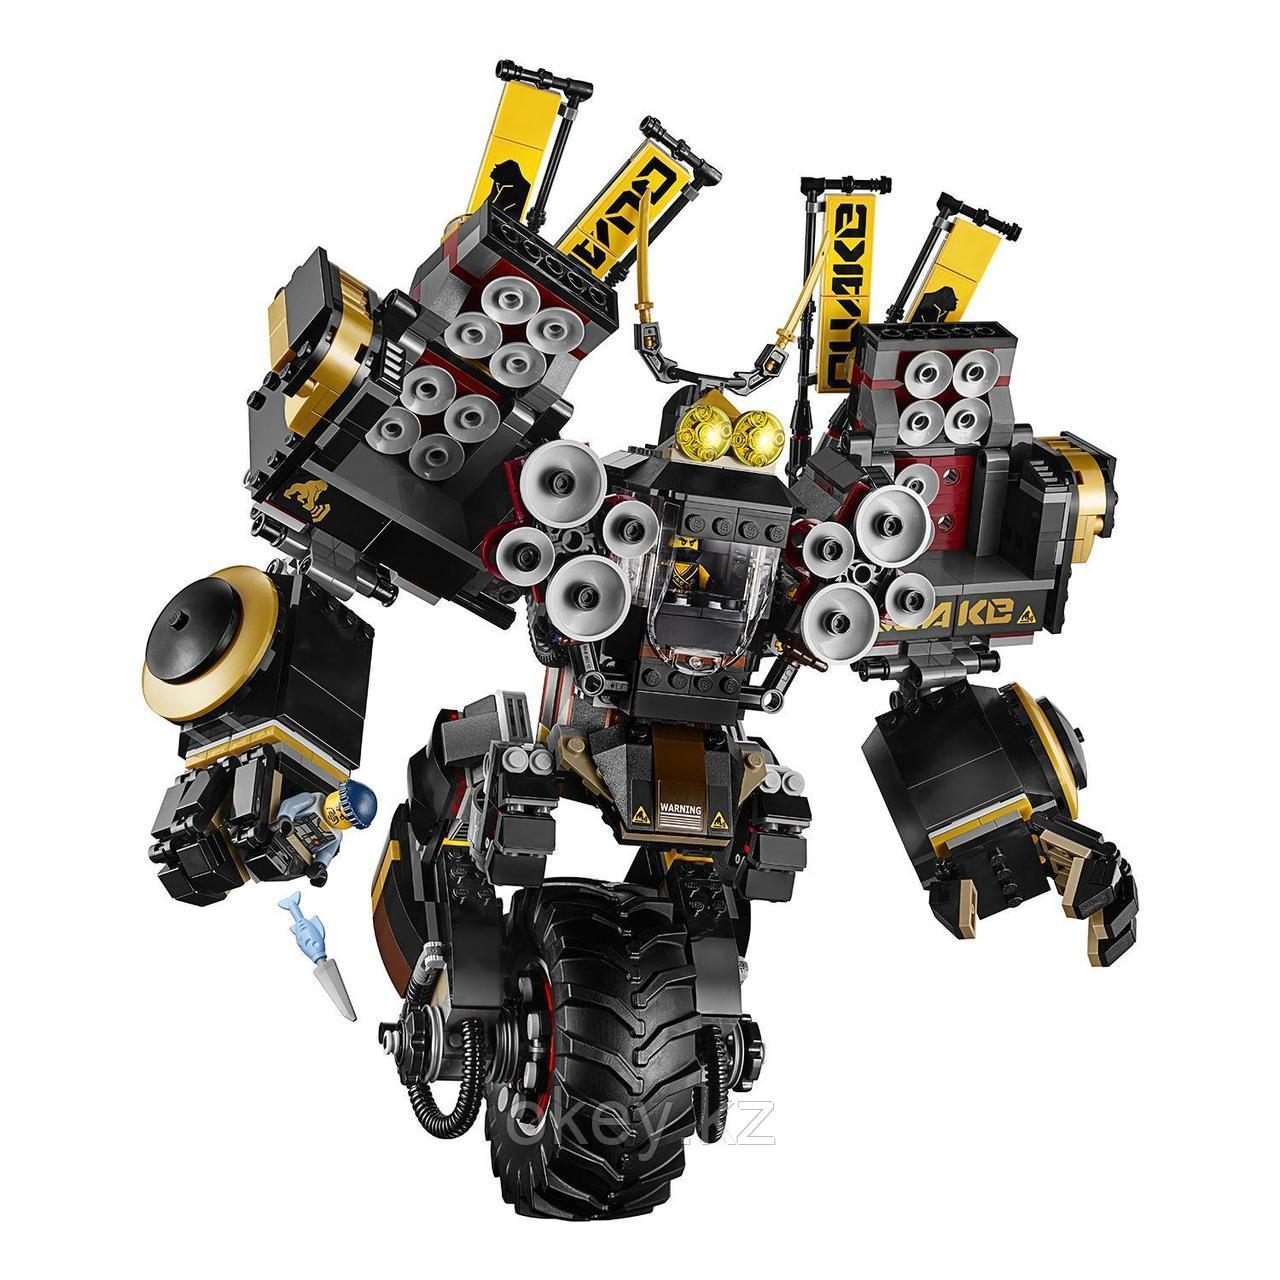 LEGO Ninjago Movie: Робот землетрясений 70632 - фото 9